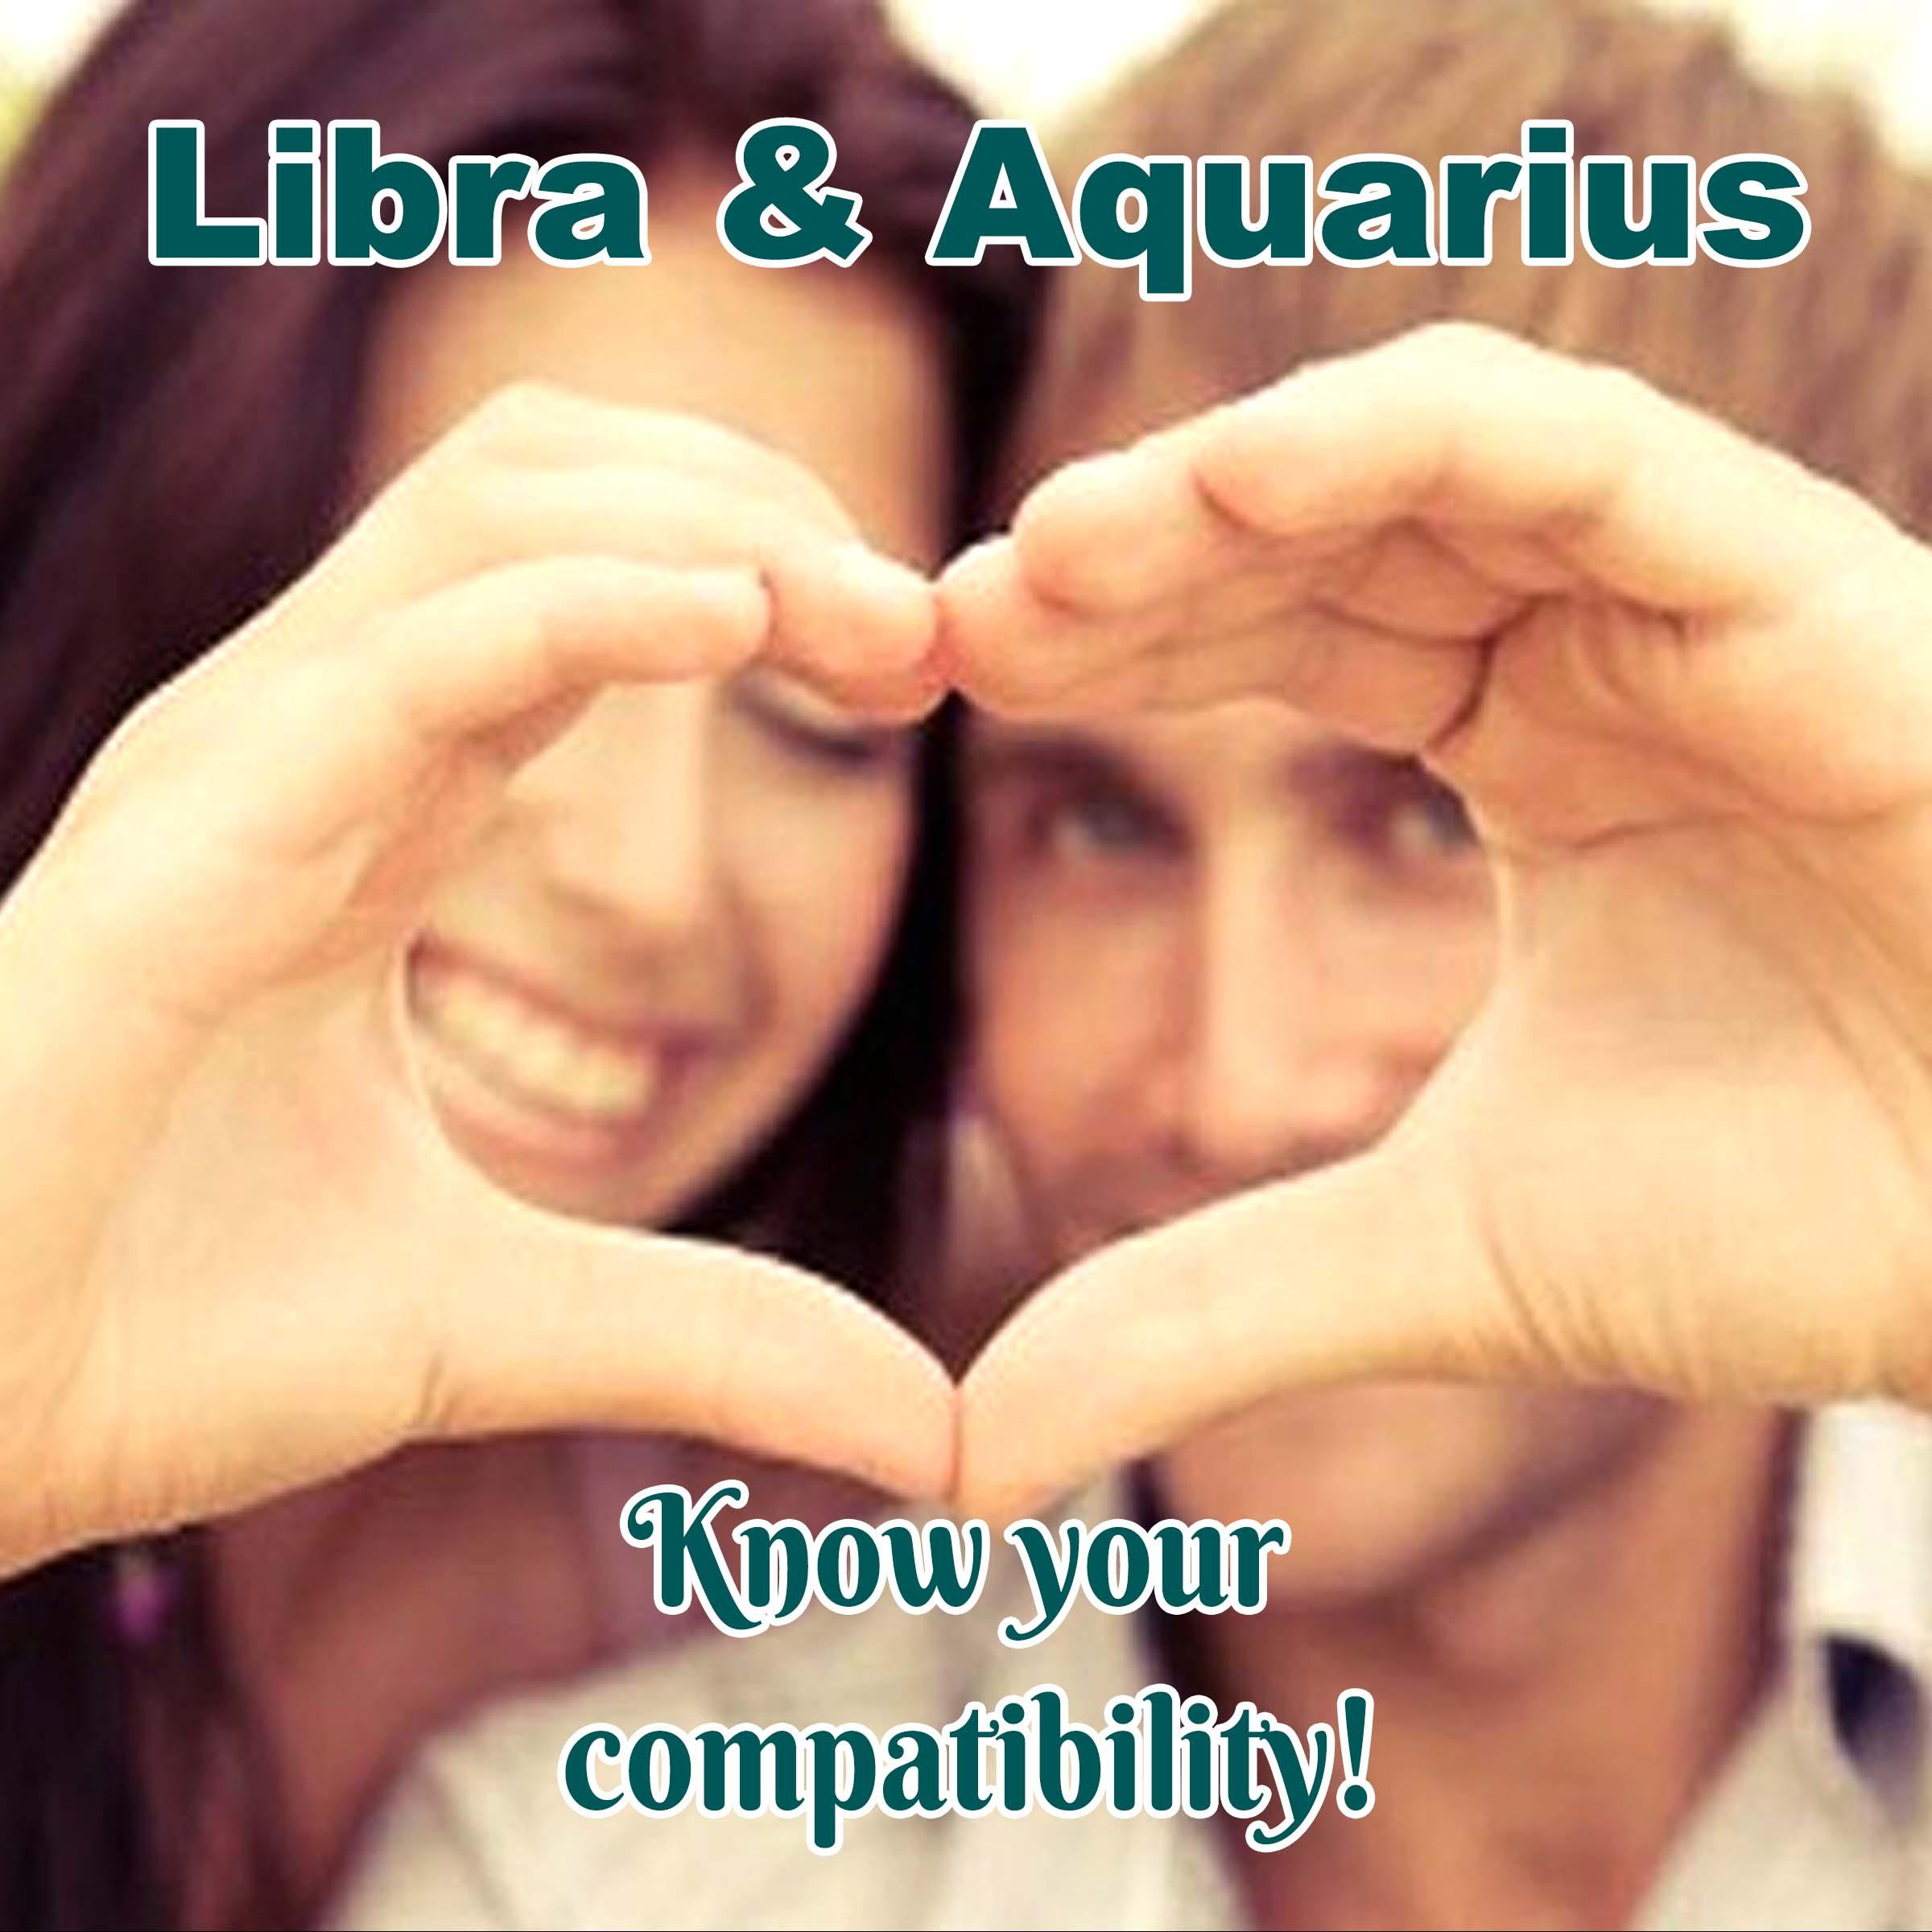 Libra n Aquarius compatibility